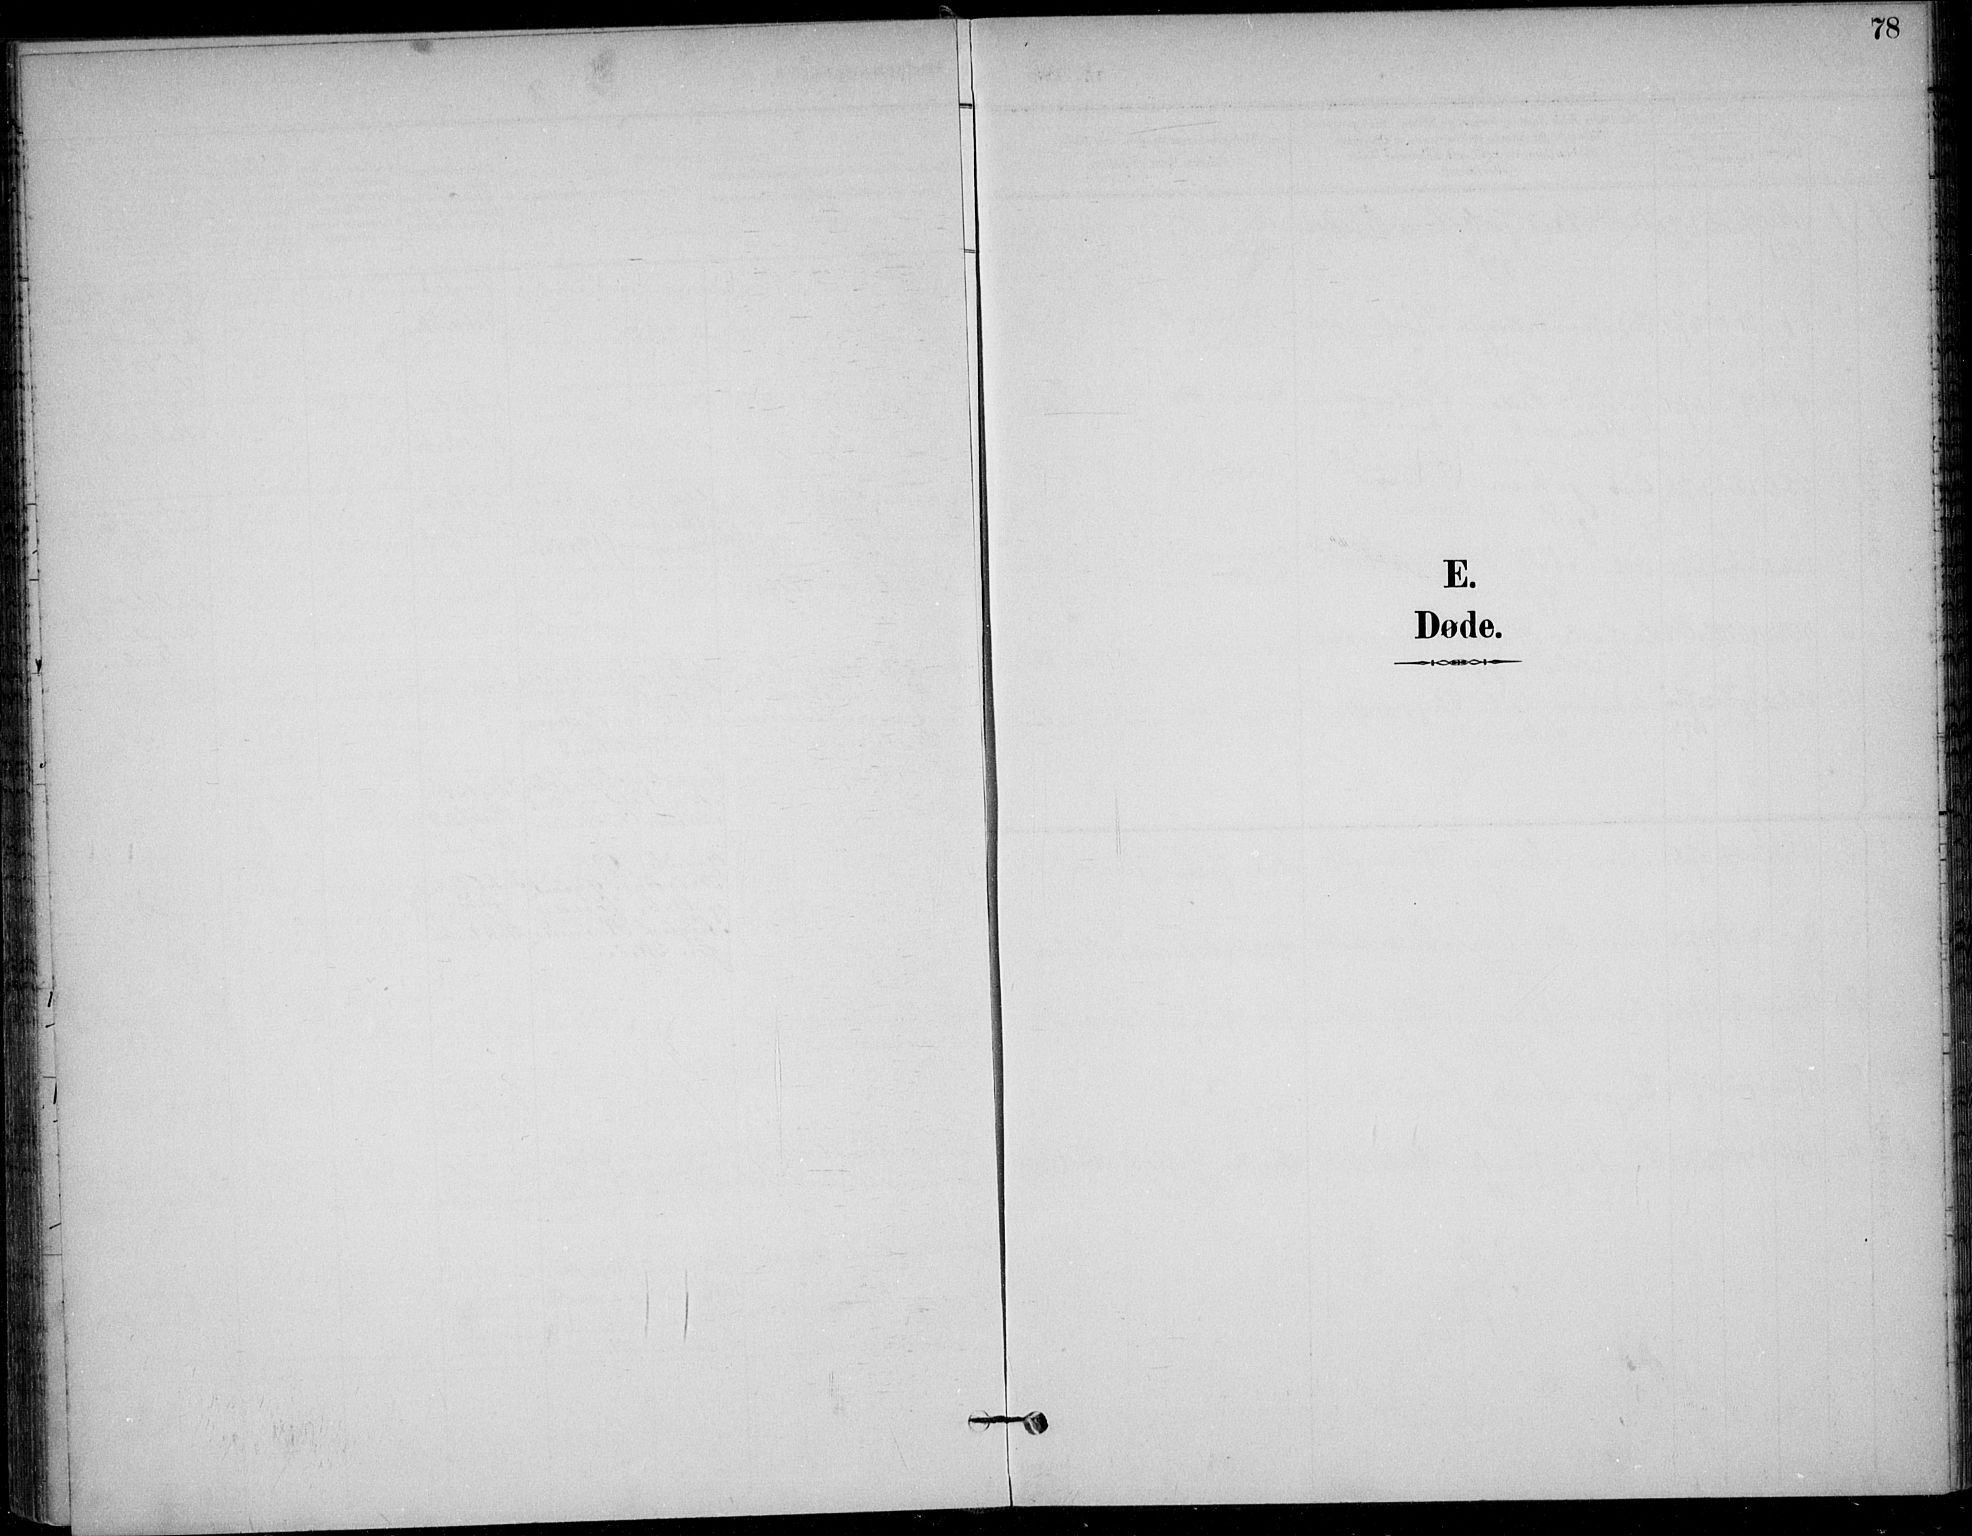 SAKO, Solum kirkebøker, F/Fc/L0002: Ministerialbok nr. III 2, 1892-1906, s. 78